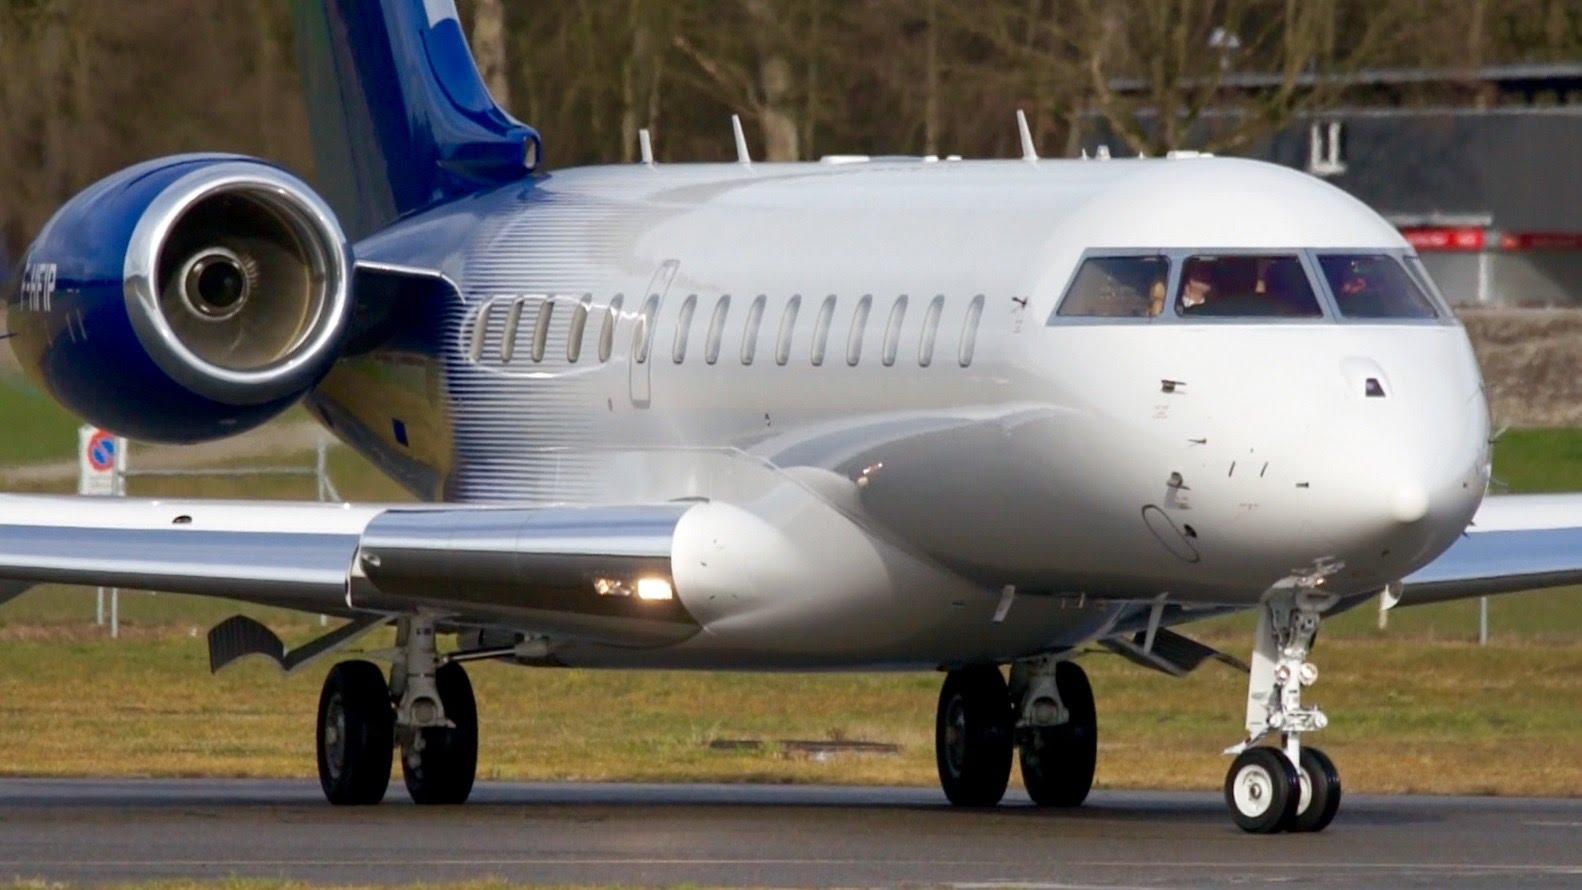 180 - Аэропорт Менди (Mendi) коды IATA: MDU ICAO: AYMN город: Менди (Mendi) страна: Папуа - Новая Гвинея (Papua New Guinea)